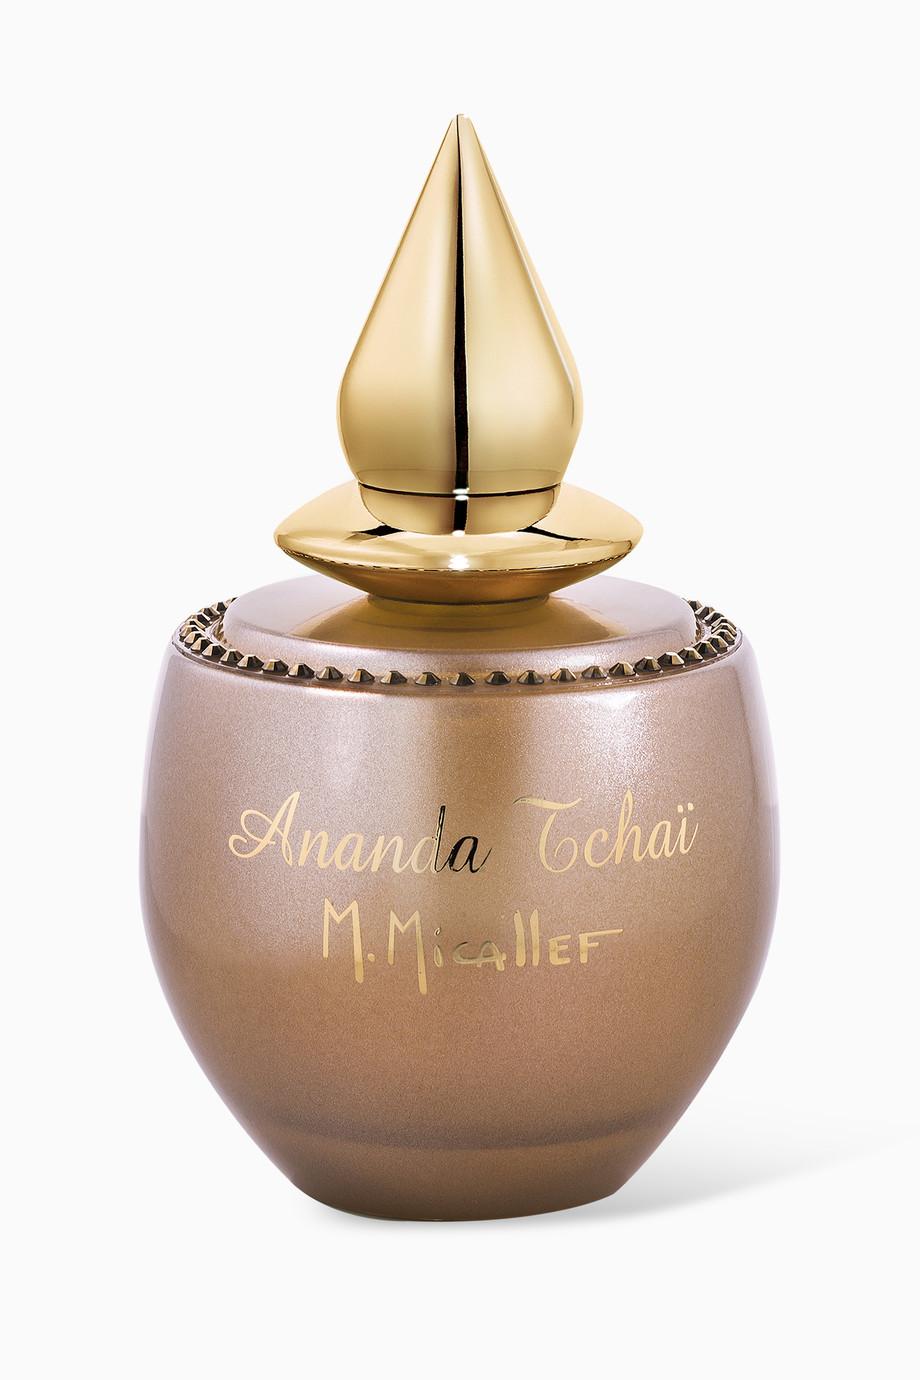 aac24f264 تسوق عطر اناندا تاكاي، 100 مل M. Micallef ملون للنساء | اُناس الكويت